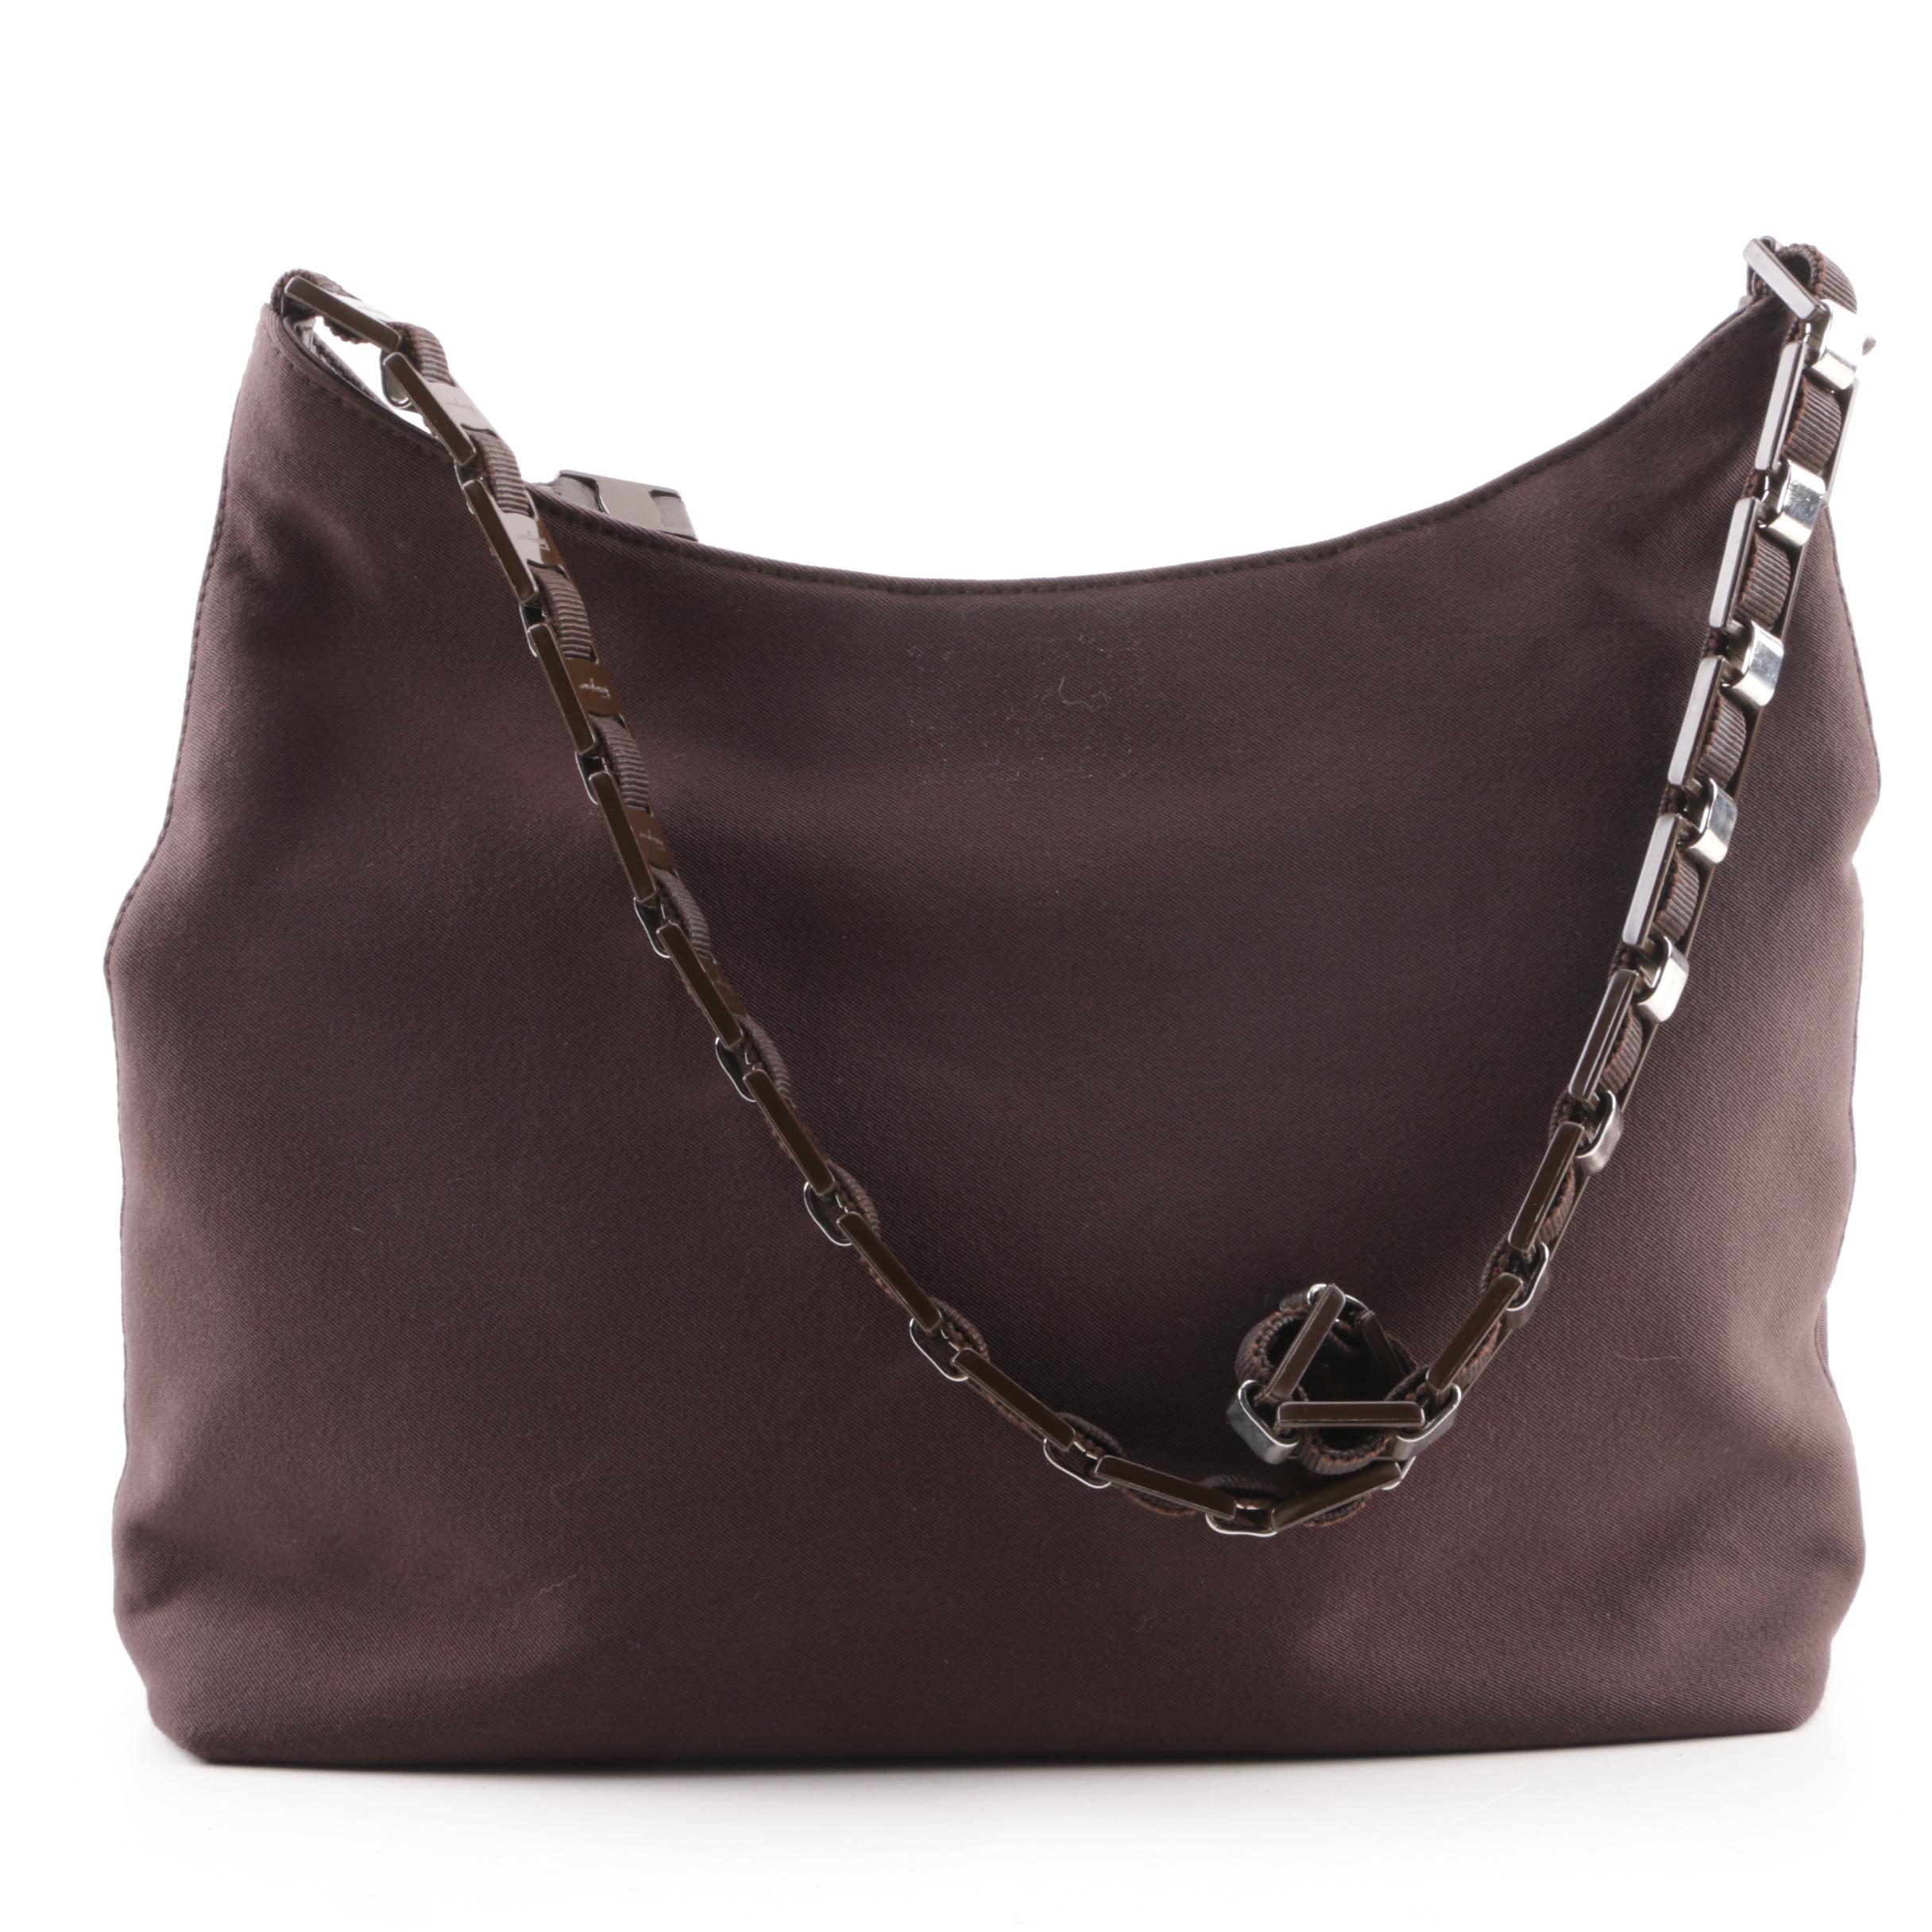 Salvatore Ferragamo Chocolate Brown Nylon Bucket Bag